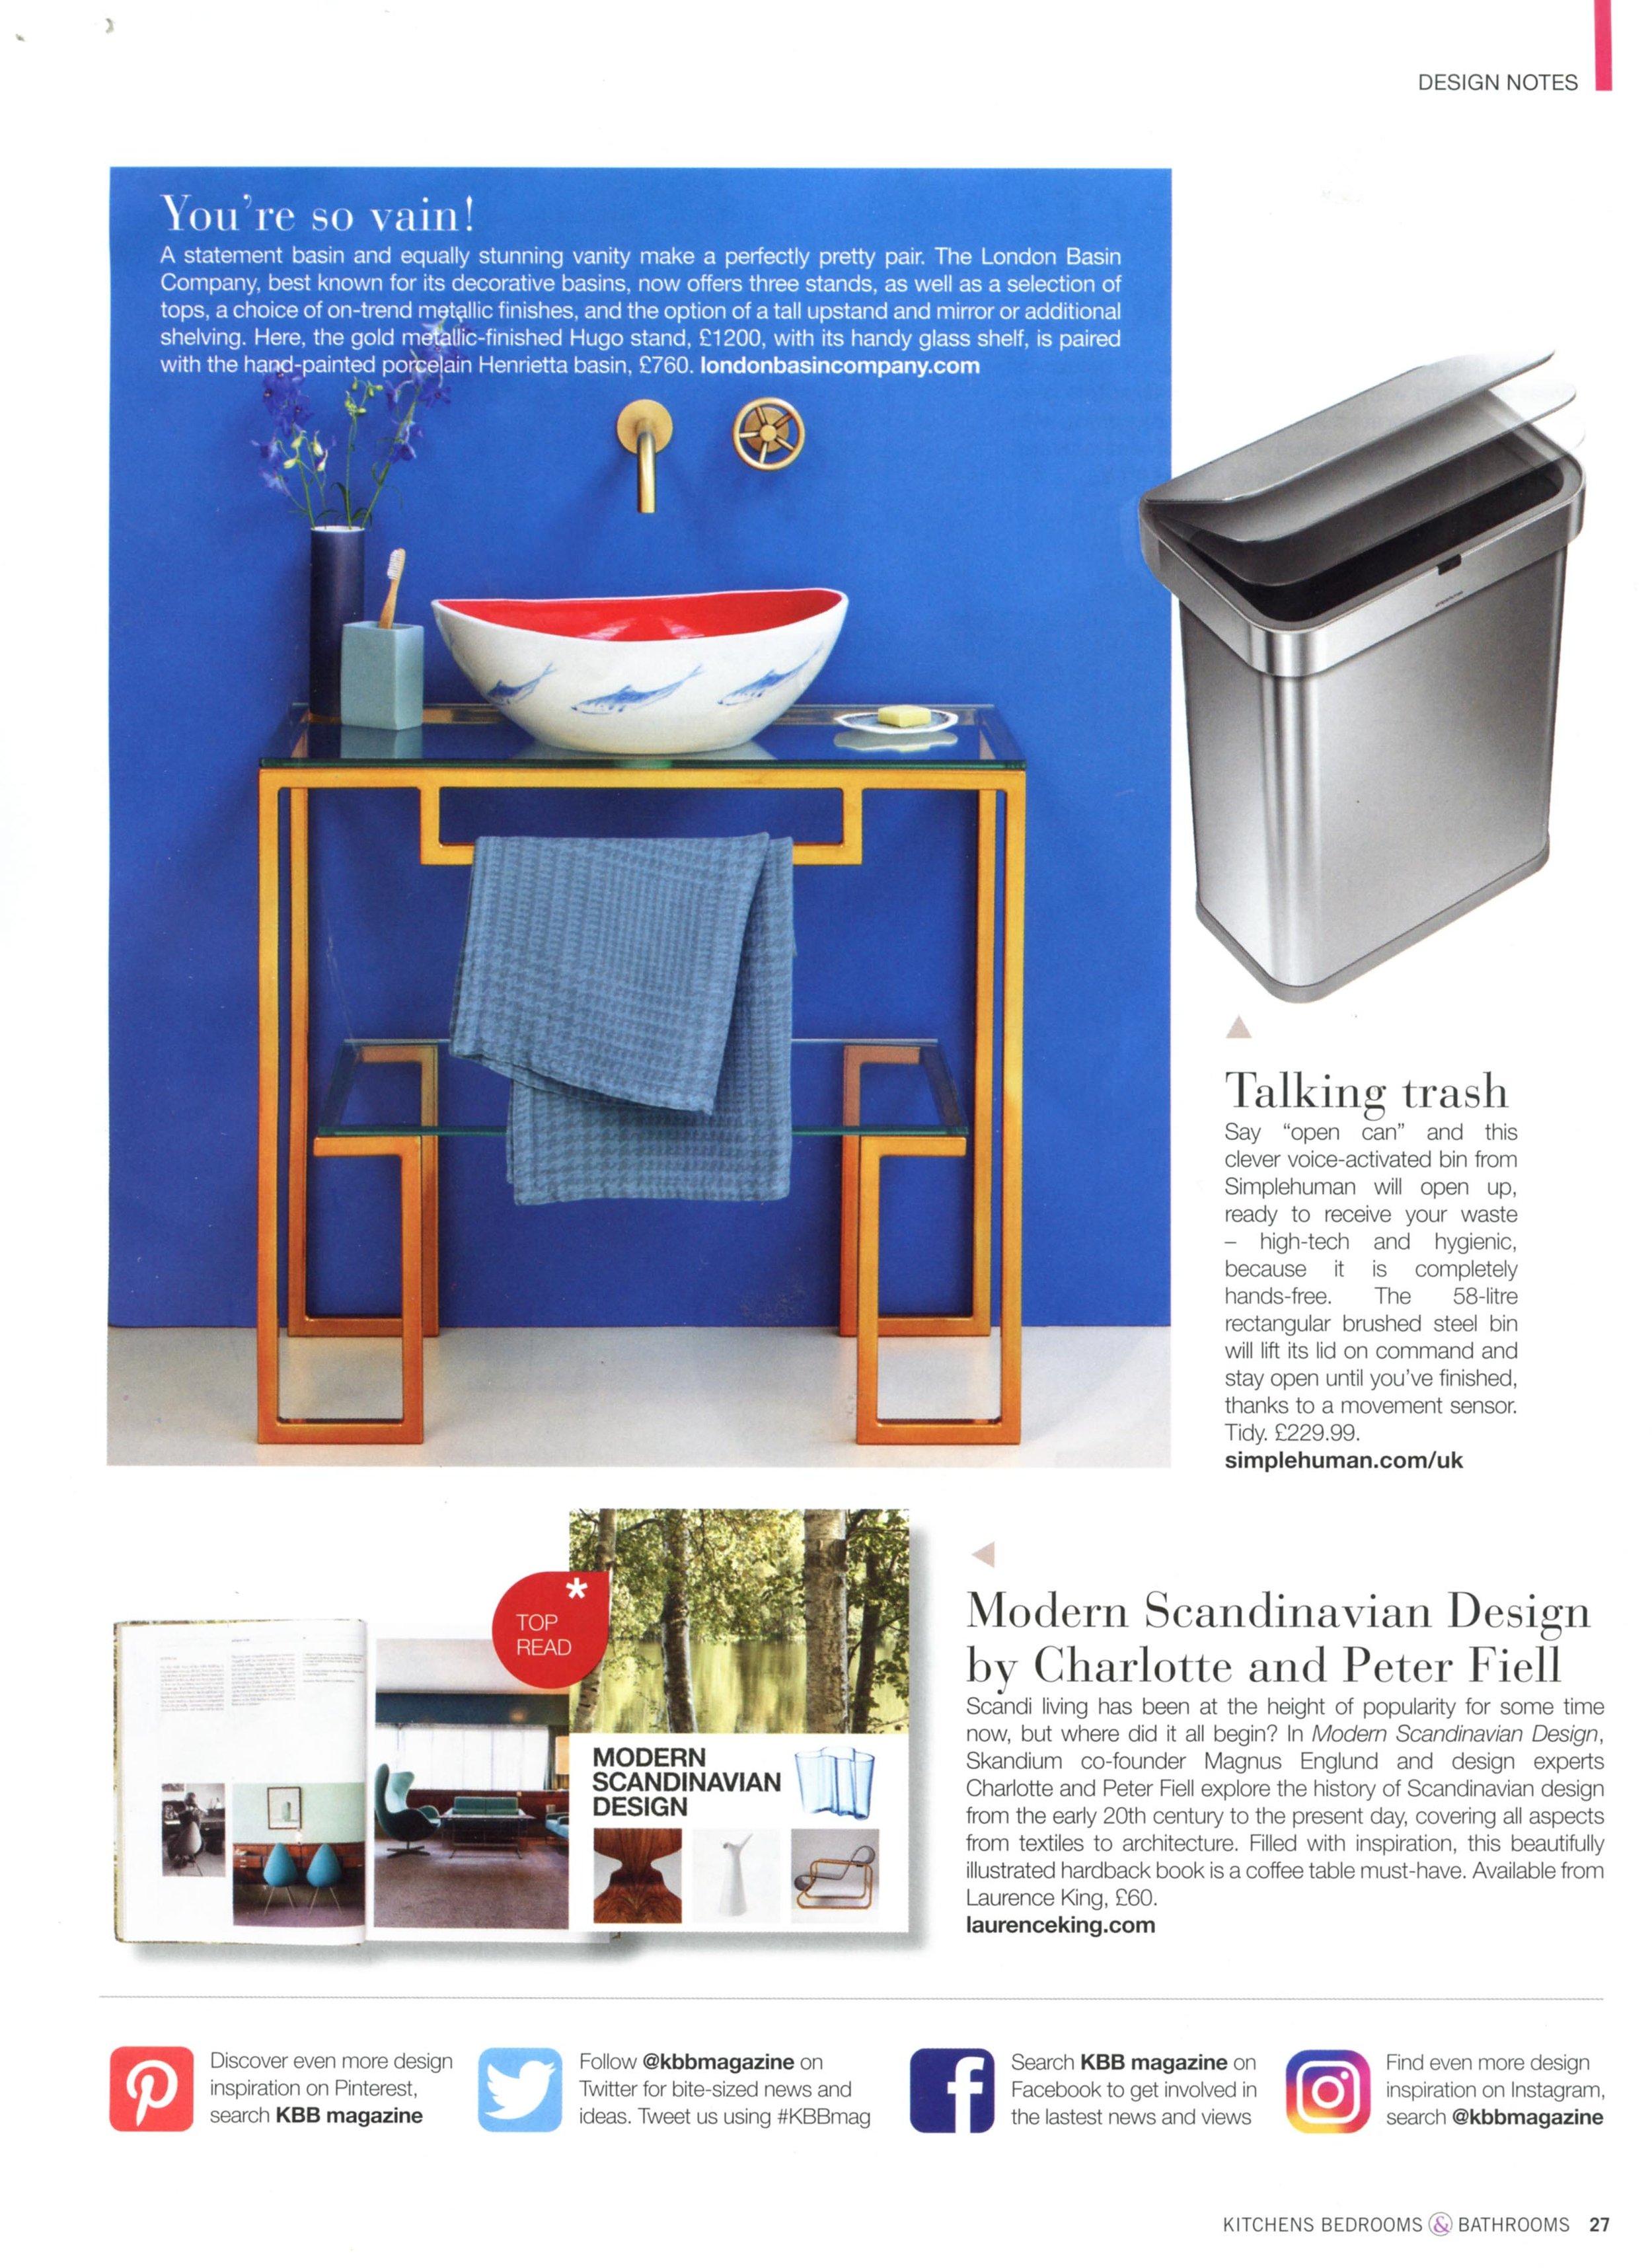 Kitchens Bedrooms & Bathrooms January 2018 LBC.jpg